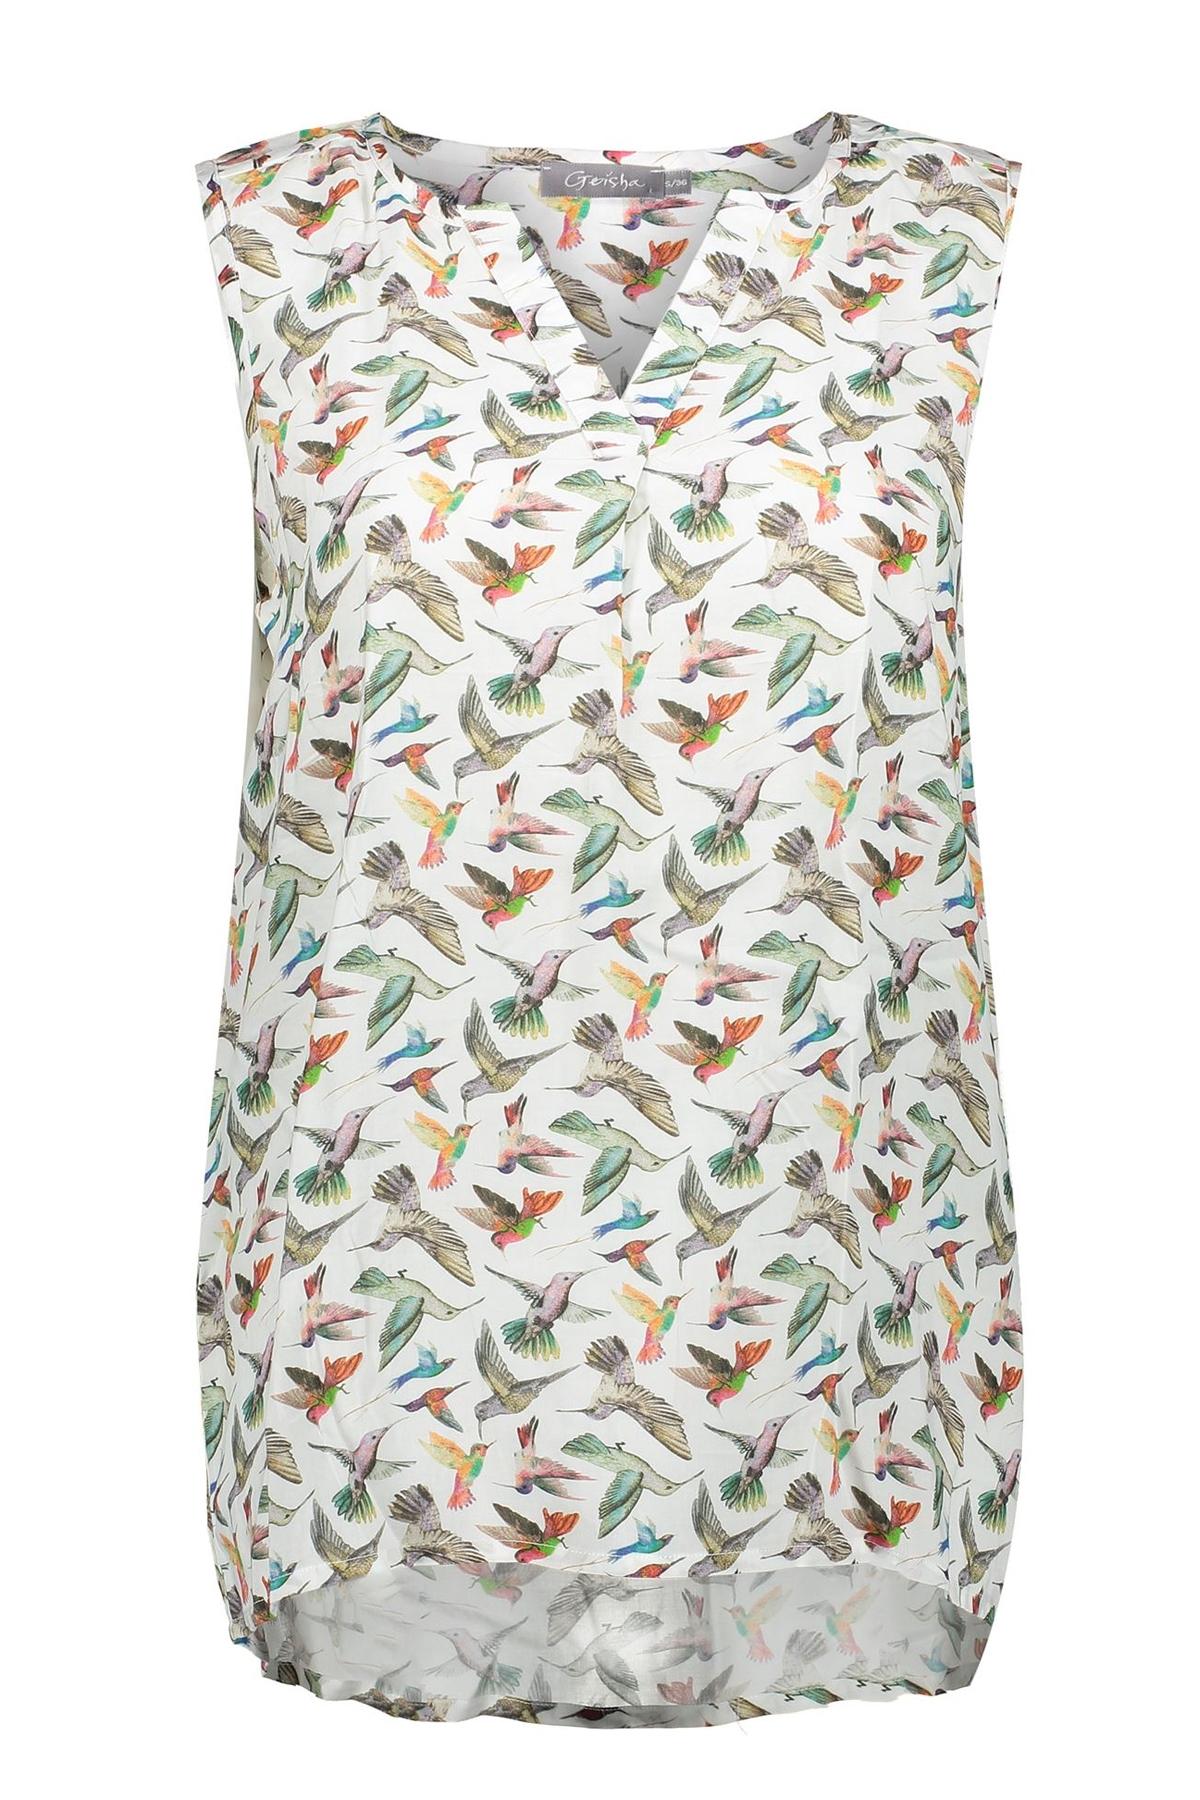 Geisha Shirt - Top Multicolor 03153-61